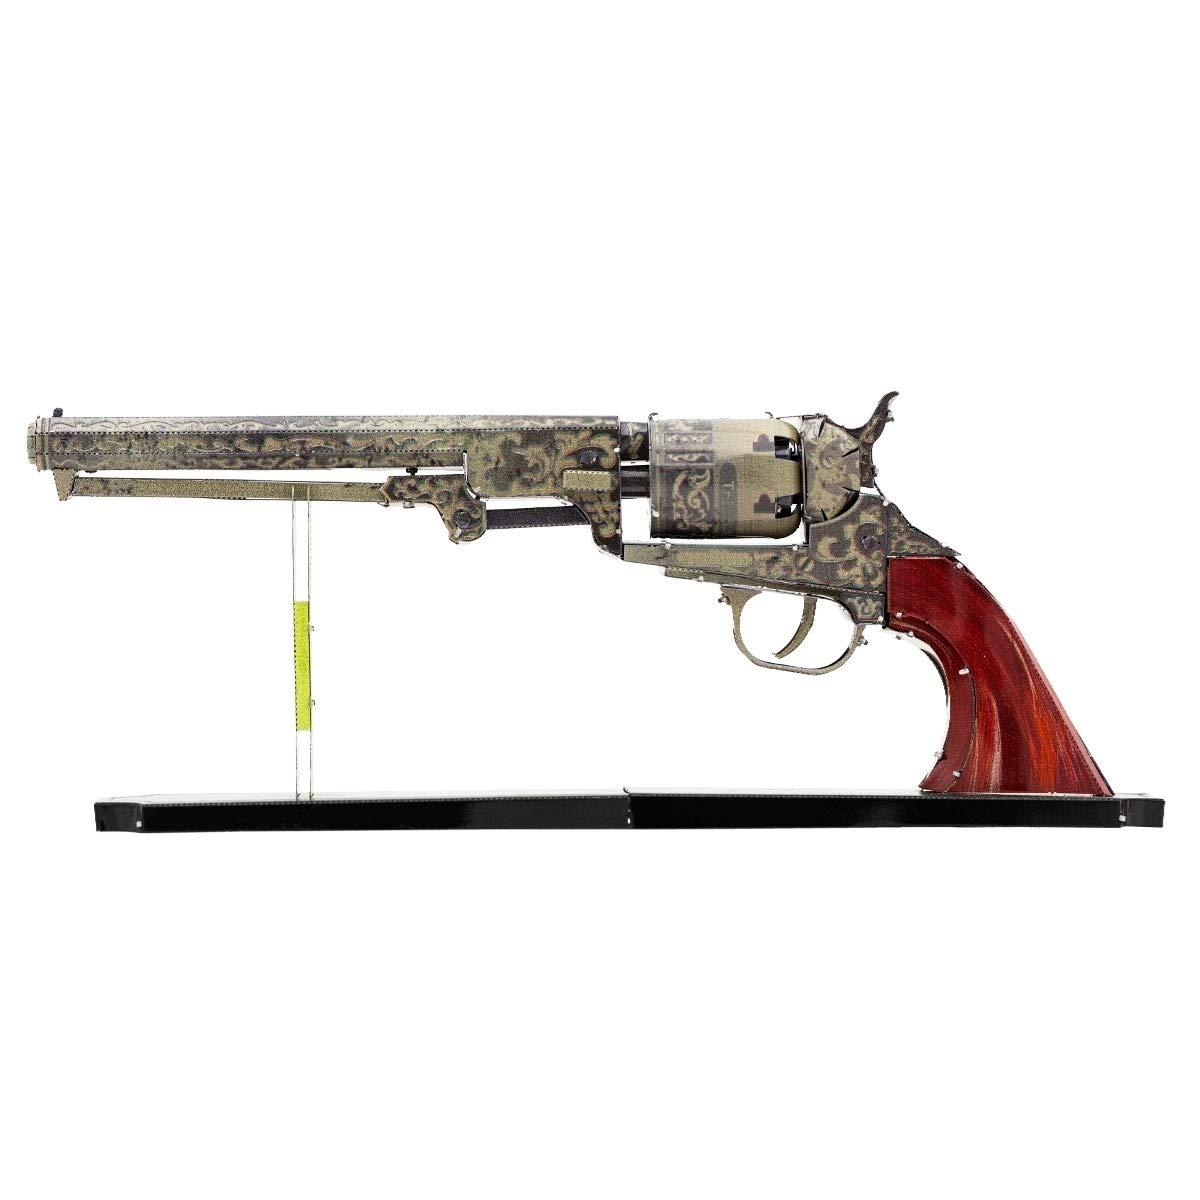 Fascinations Metal Earth Wild West Revolver 3D Metal Model Kit